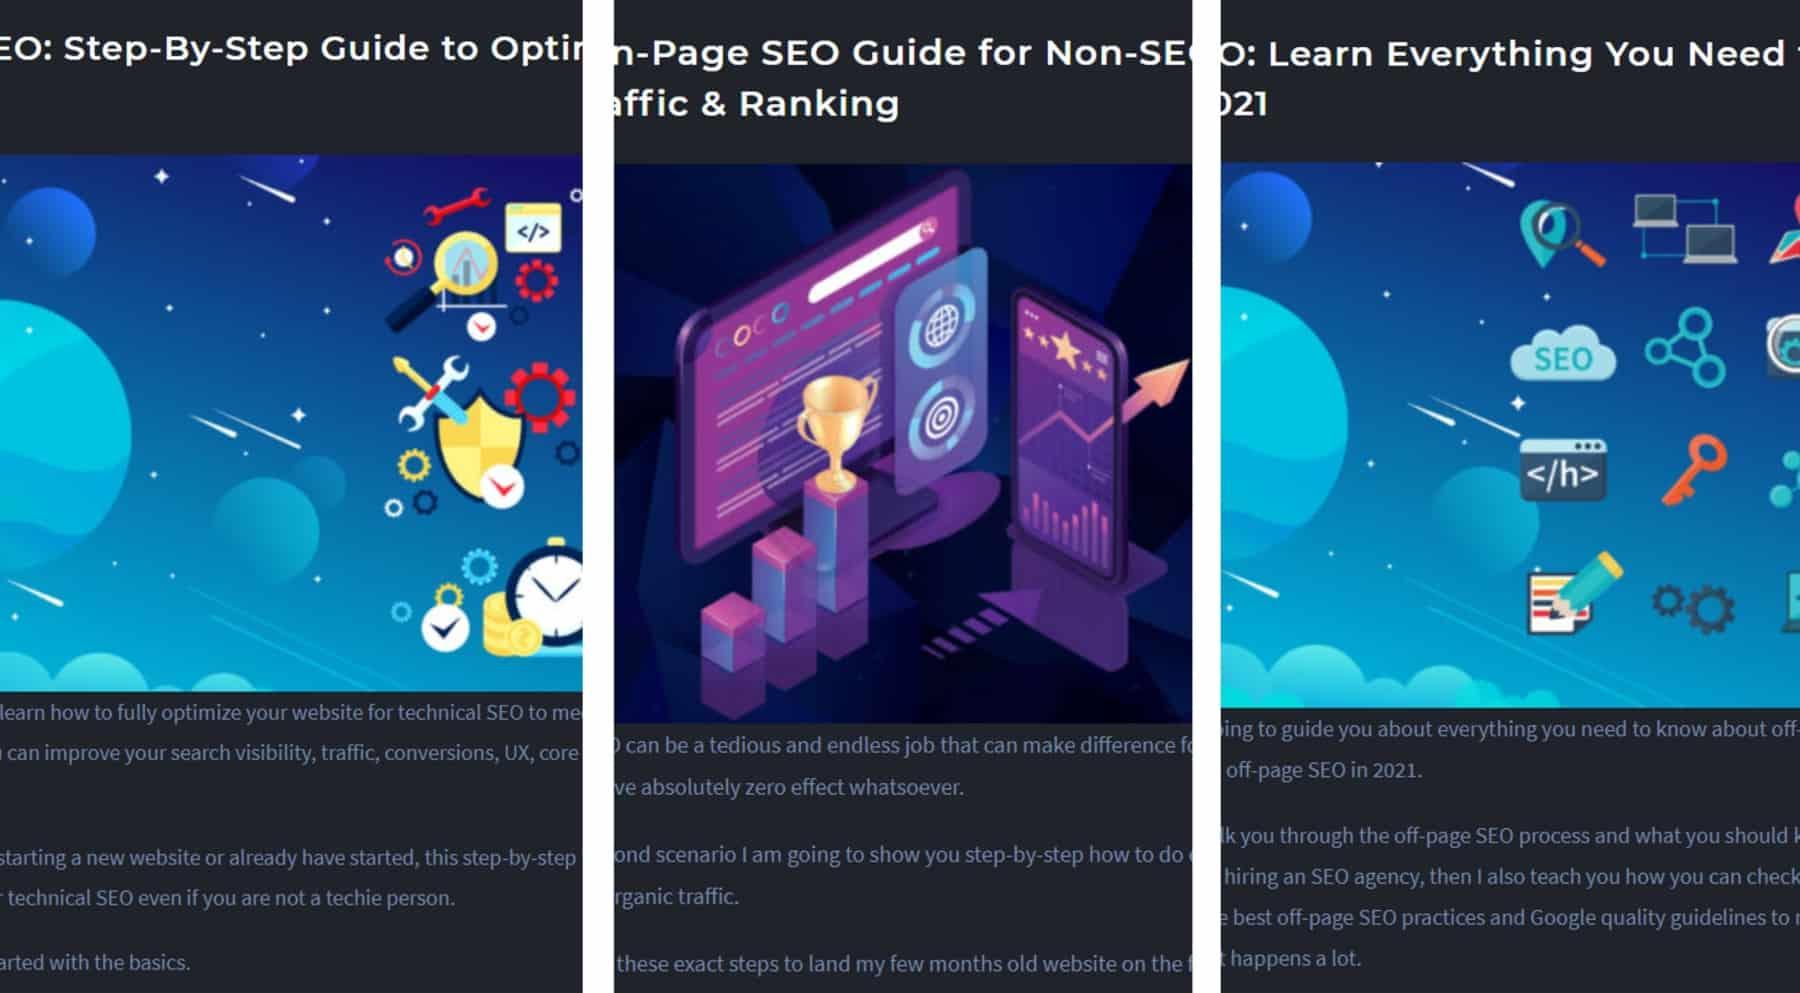 targeting seo keywords and optimizing content